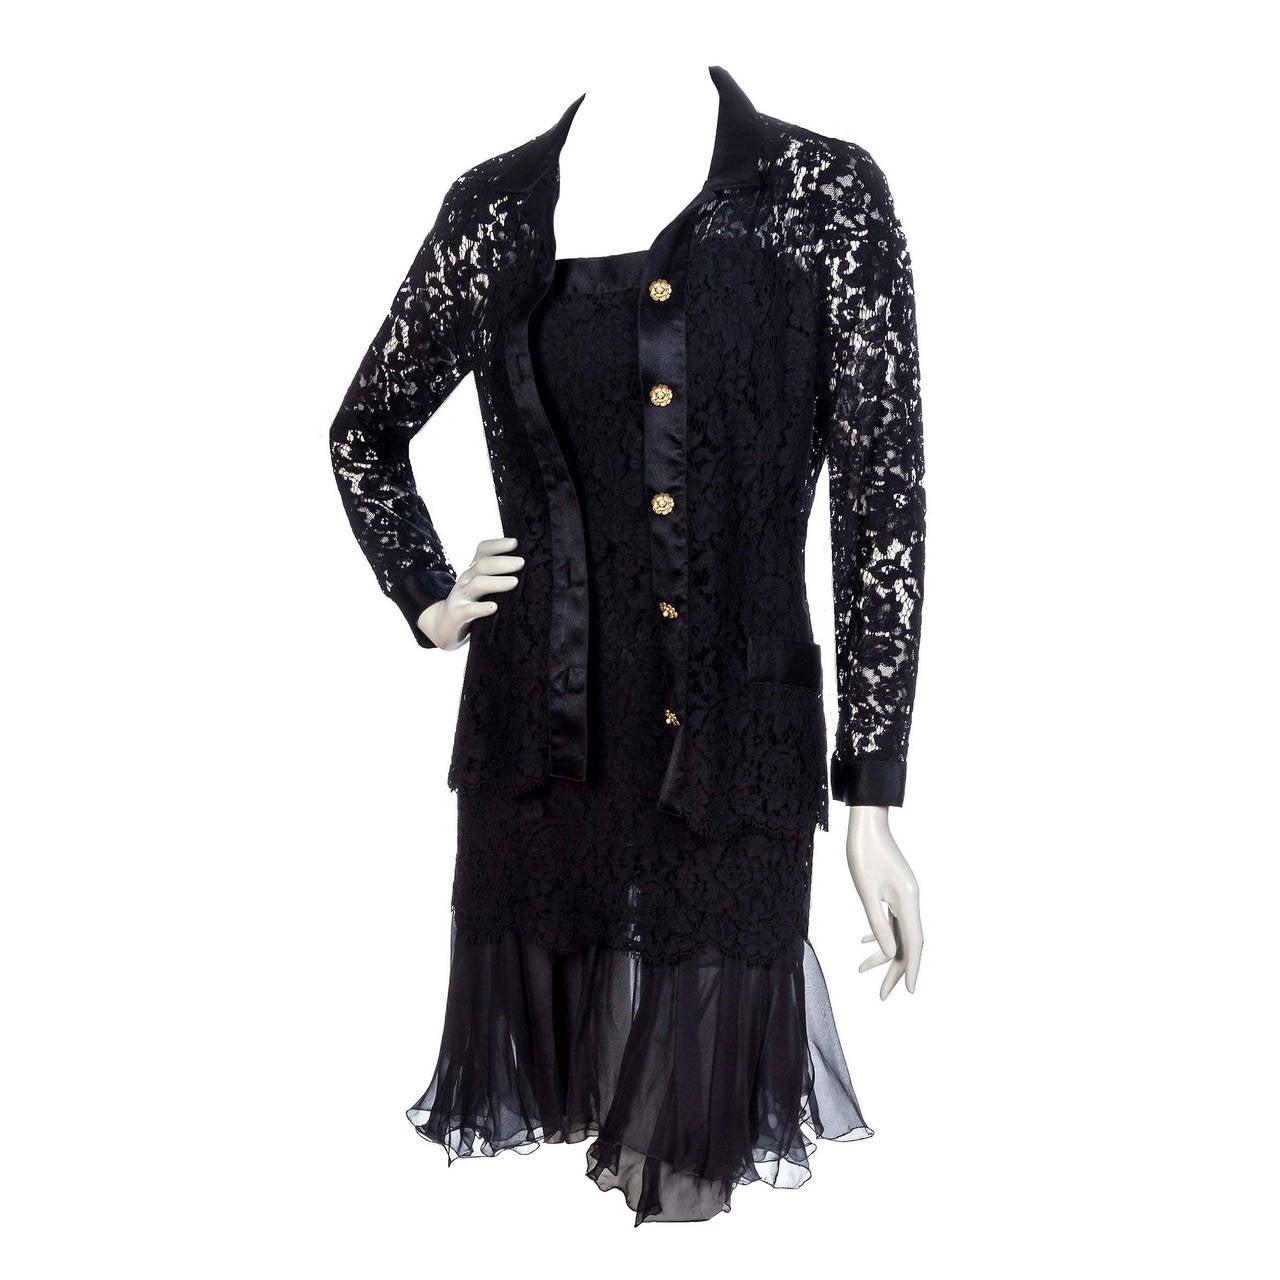 1990's Chanel Black Lace & Silk-Chiffon Illusion Hourglass Cocktail Dress Set 1